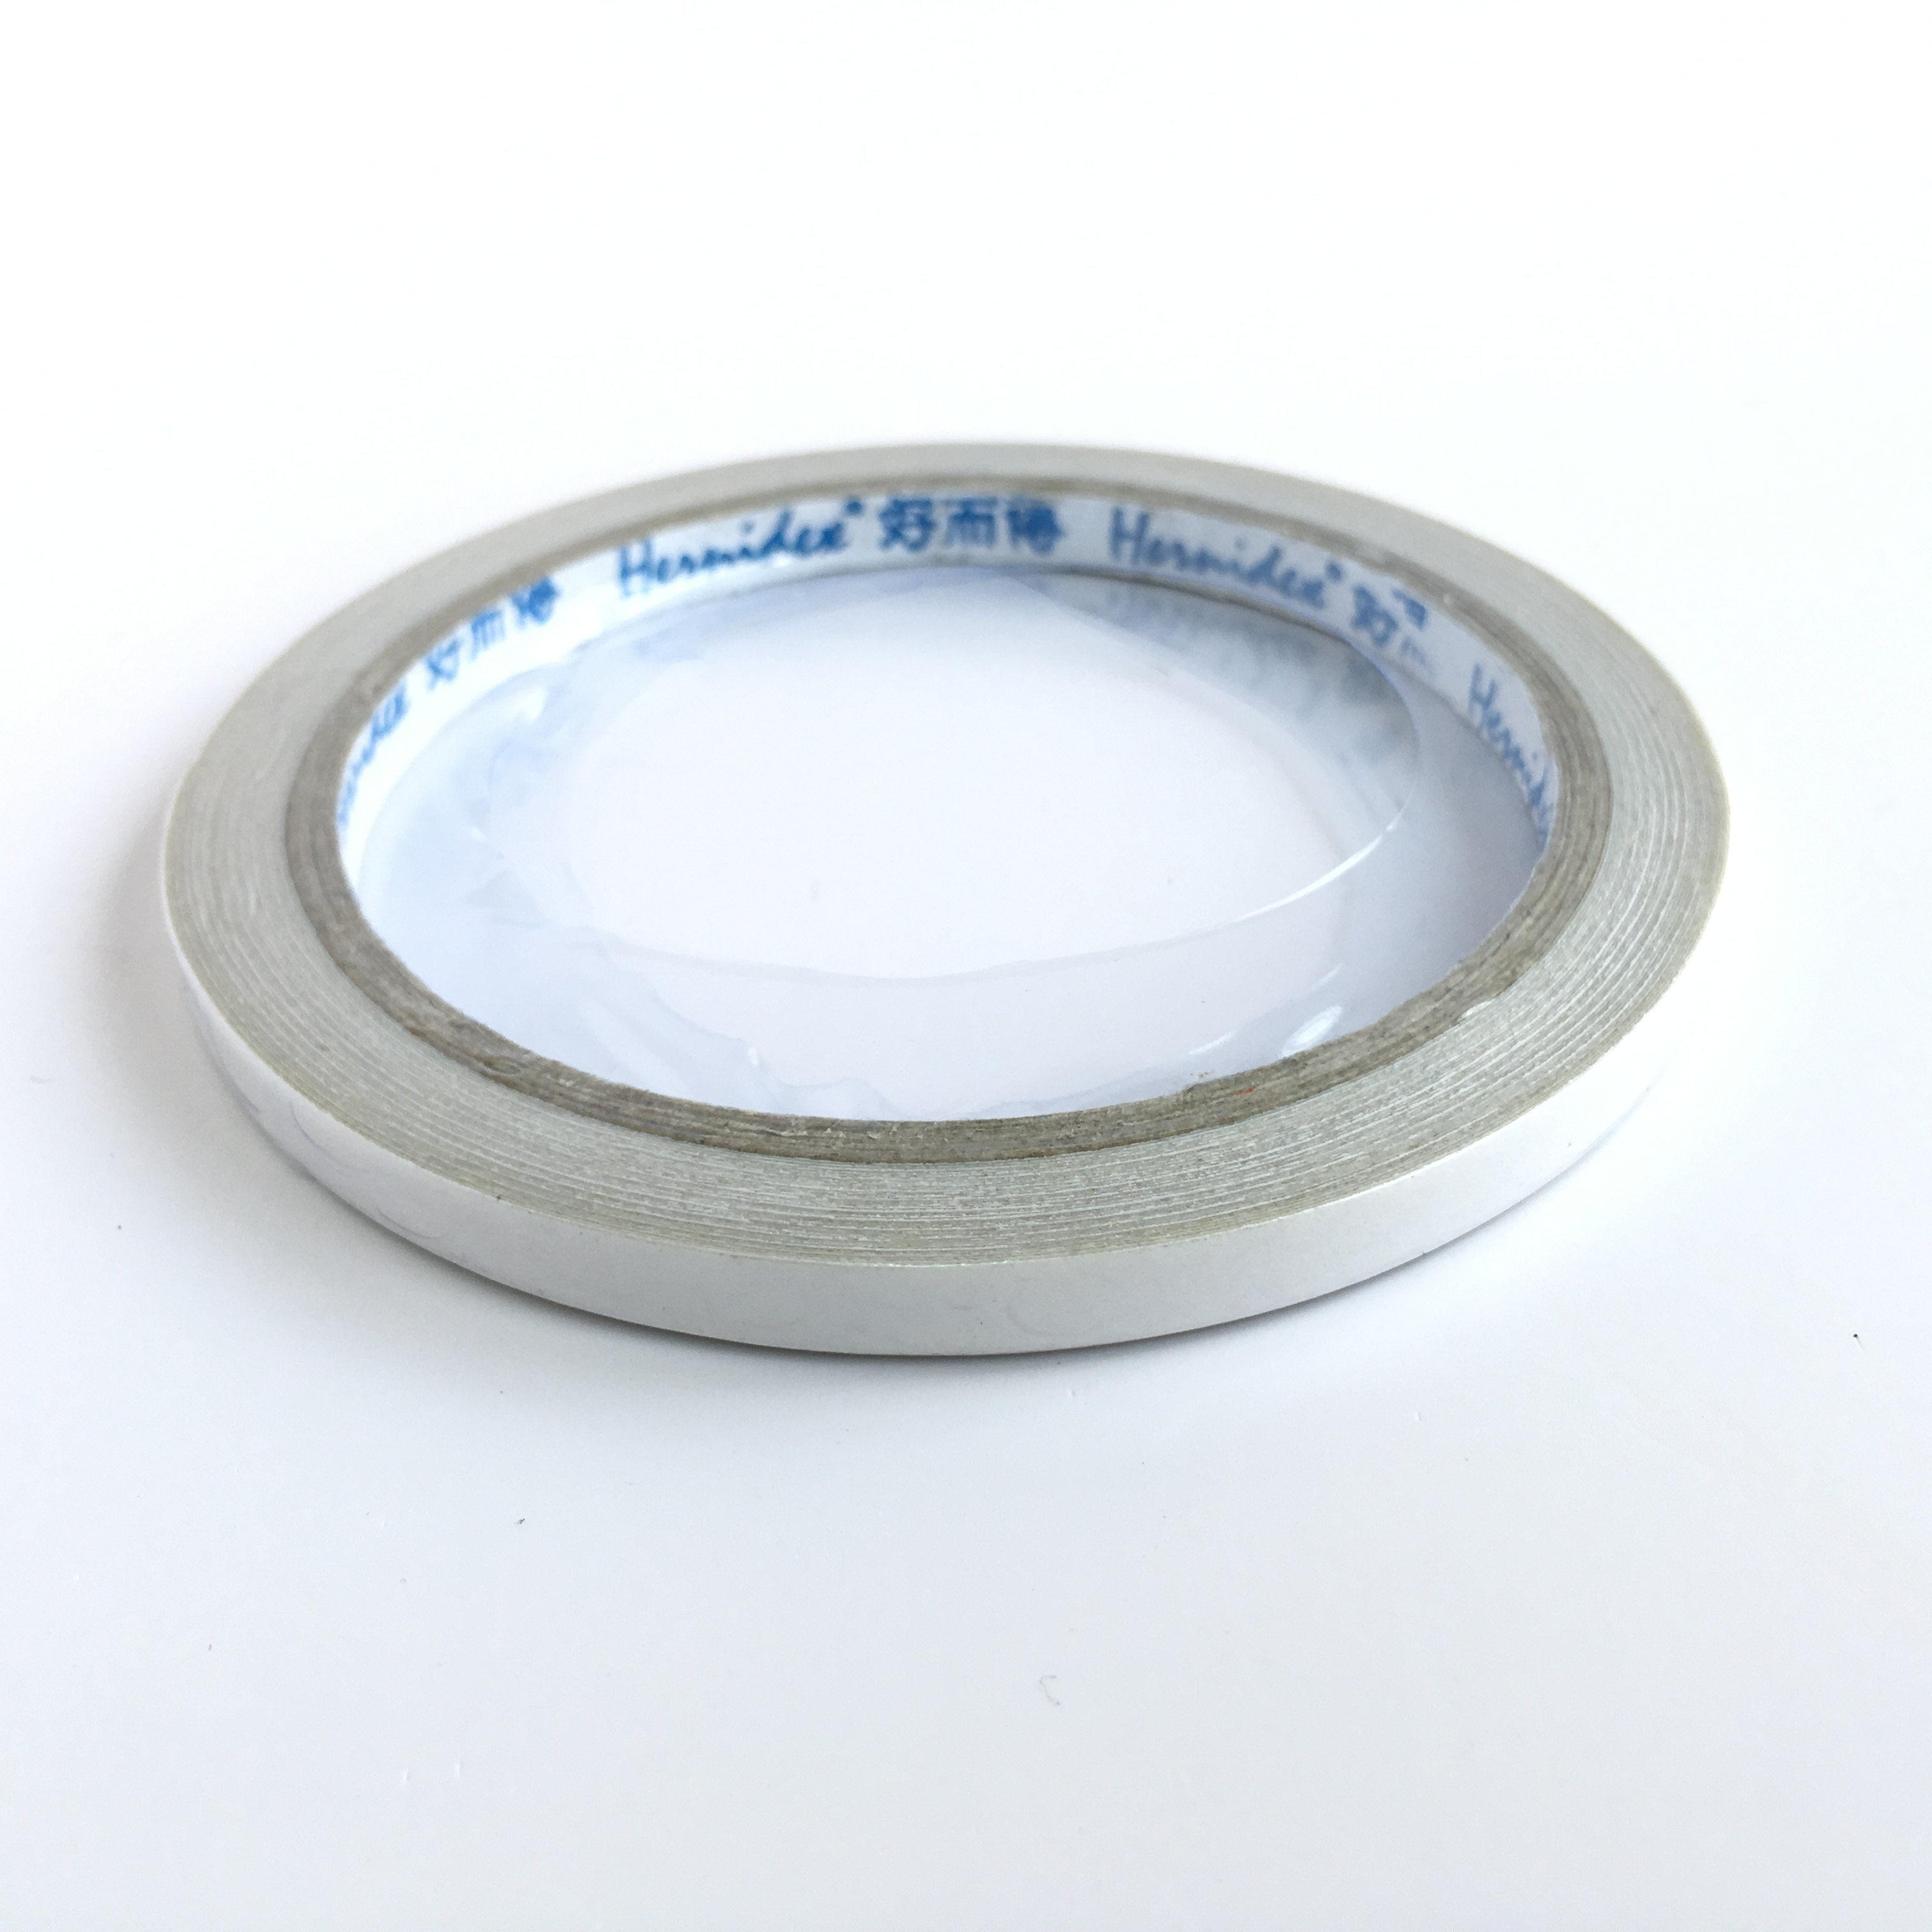 Băng keo giấy 2 mặt Hernidex (HDDT)